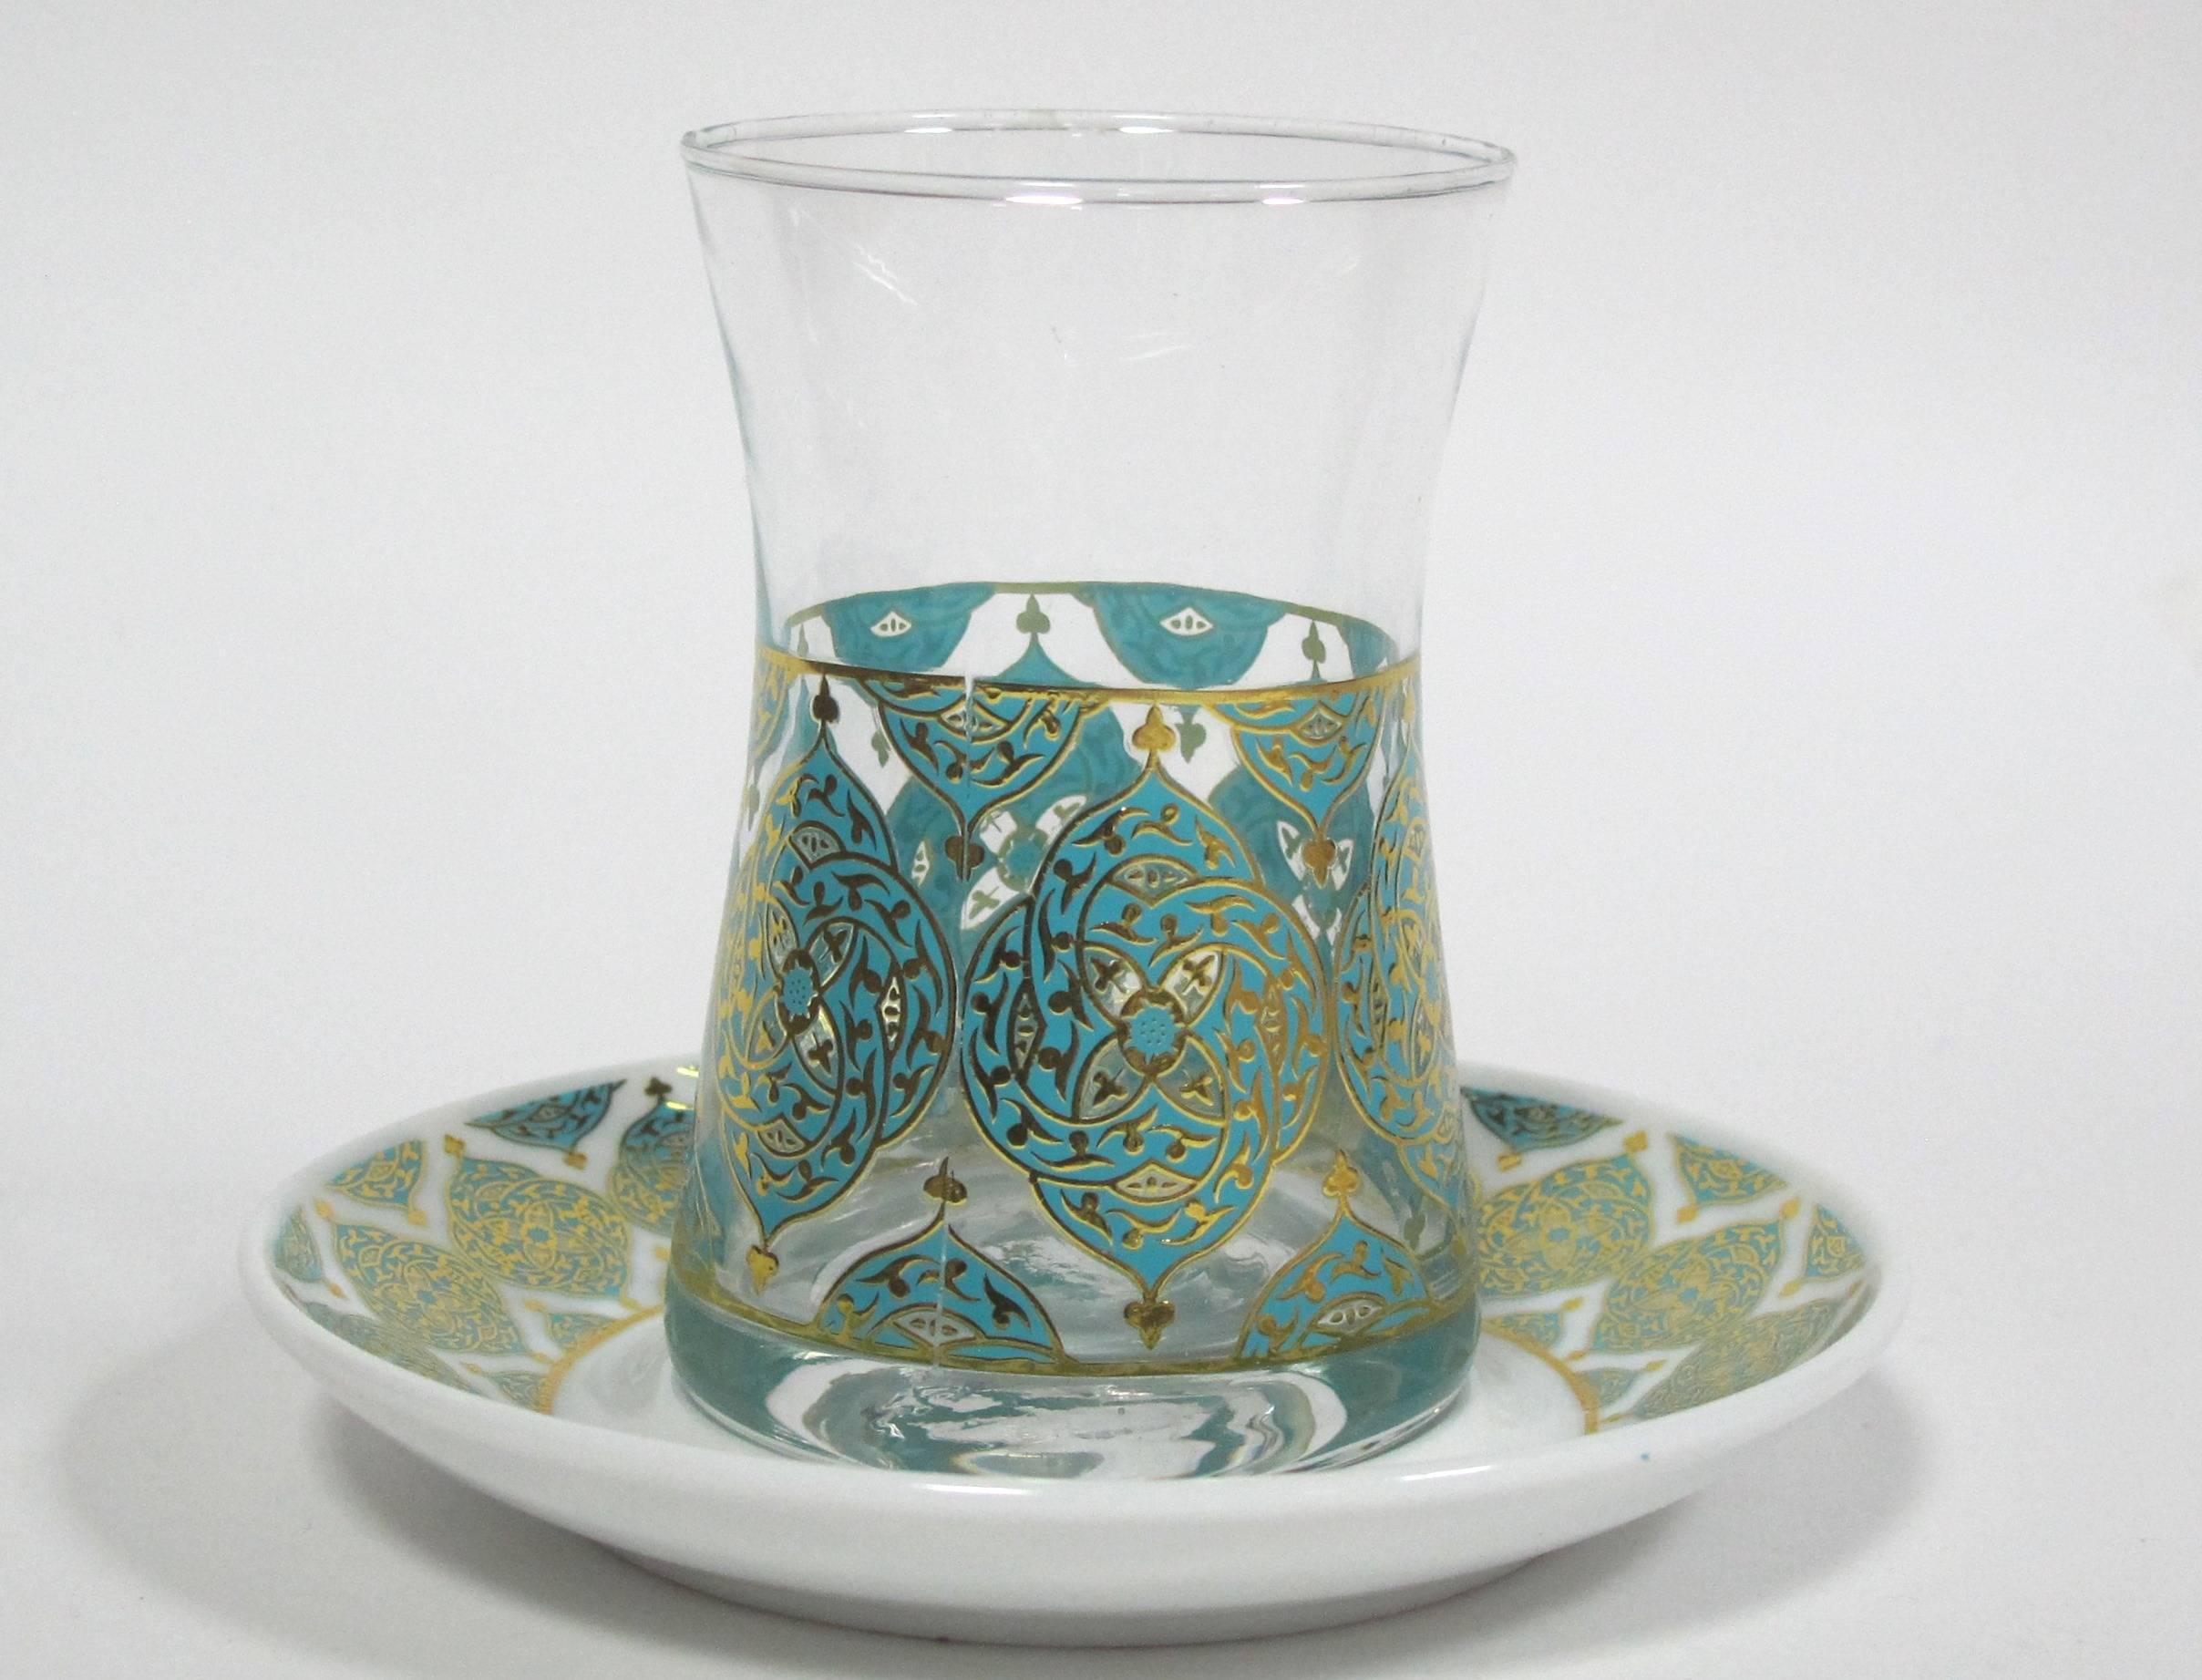 Турецкие чашки для чая (армуды)